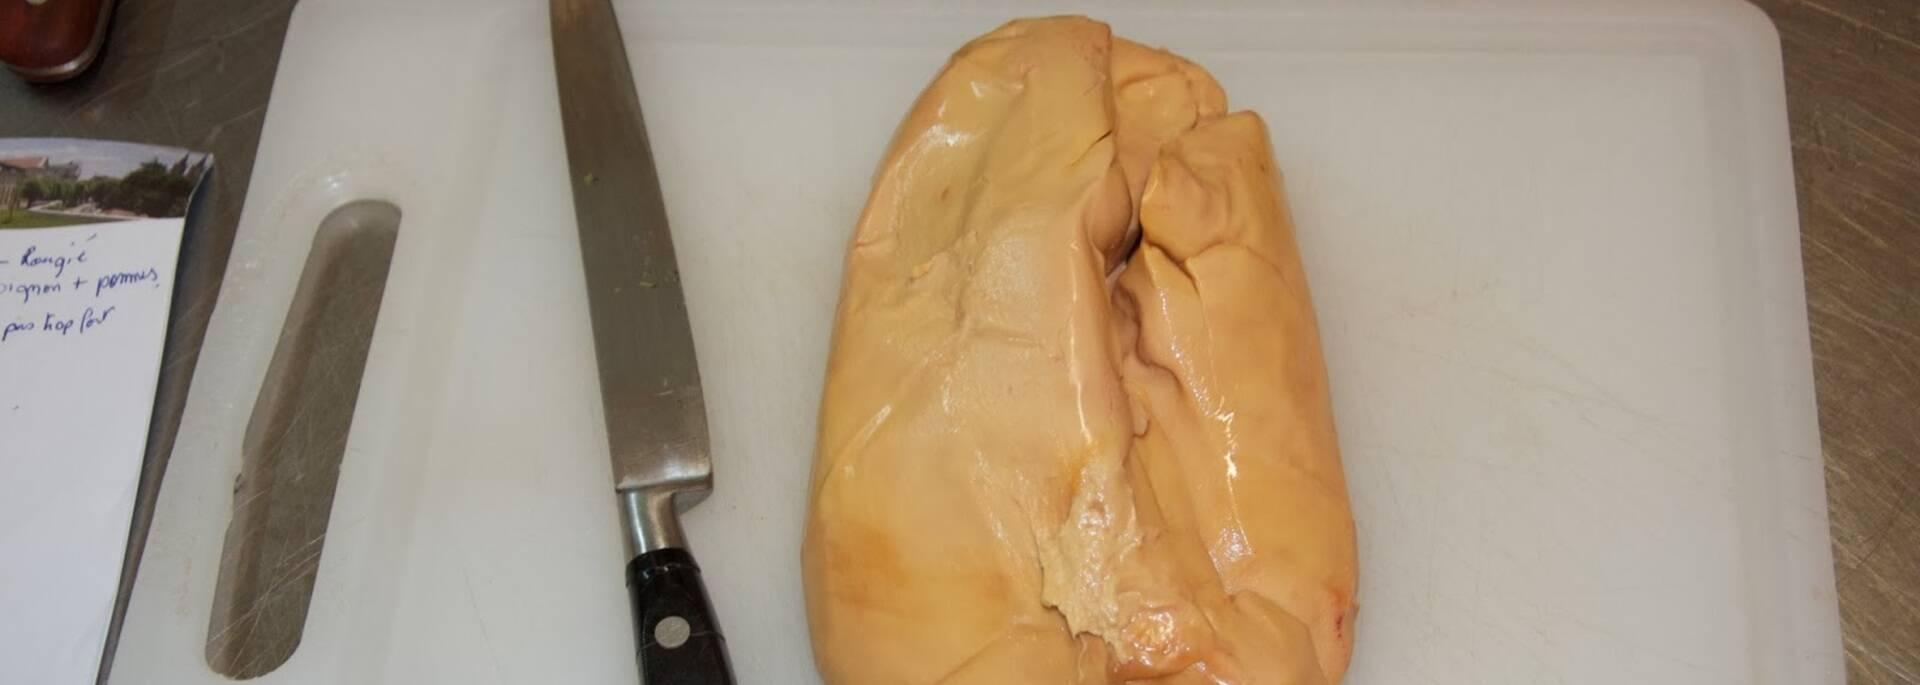 atelier foie gras rochefort